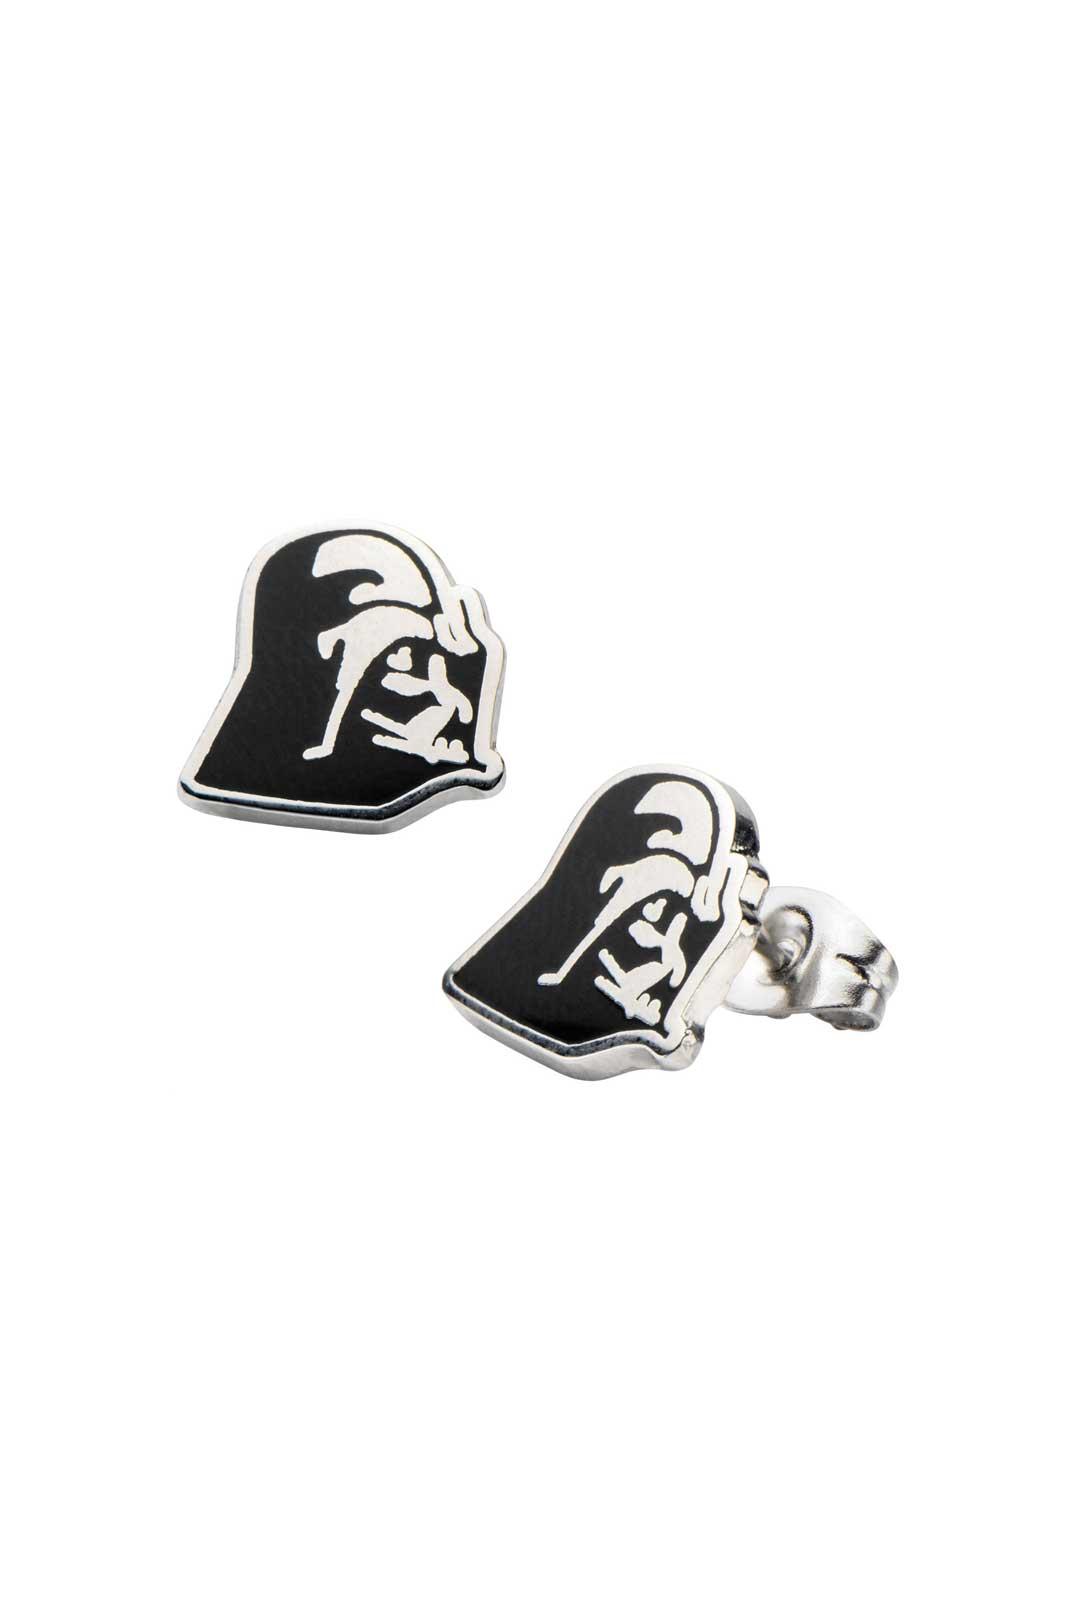 Earrings Dart Vader